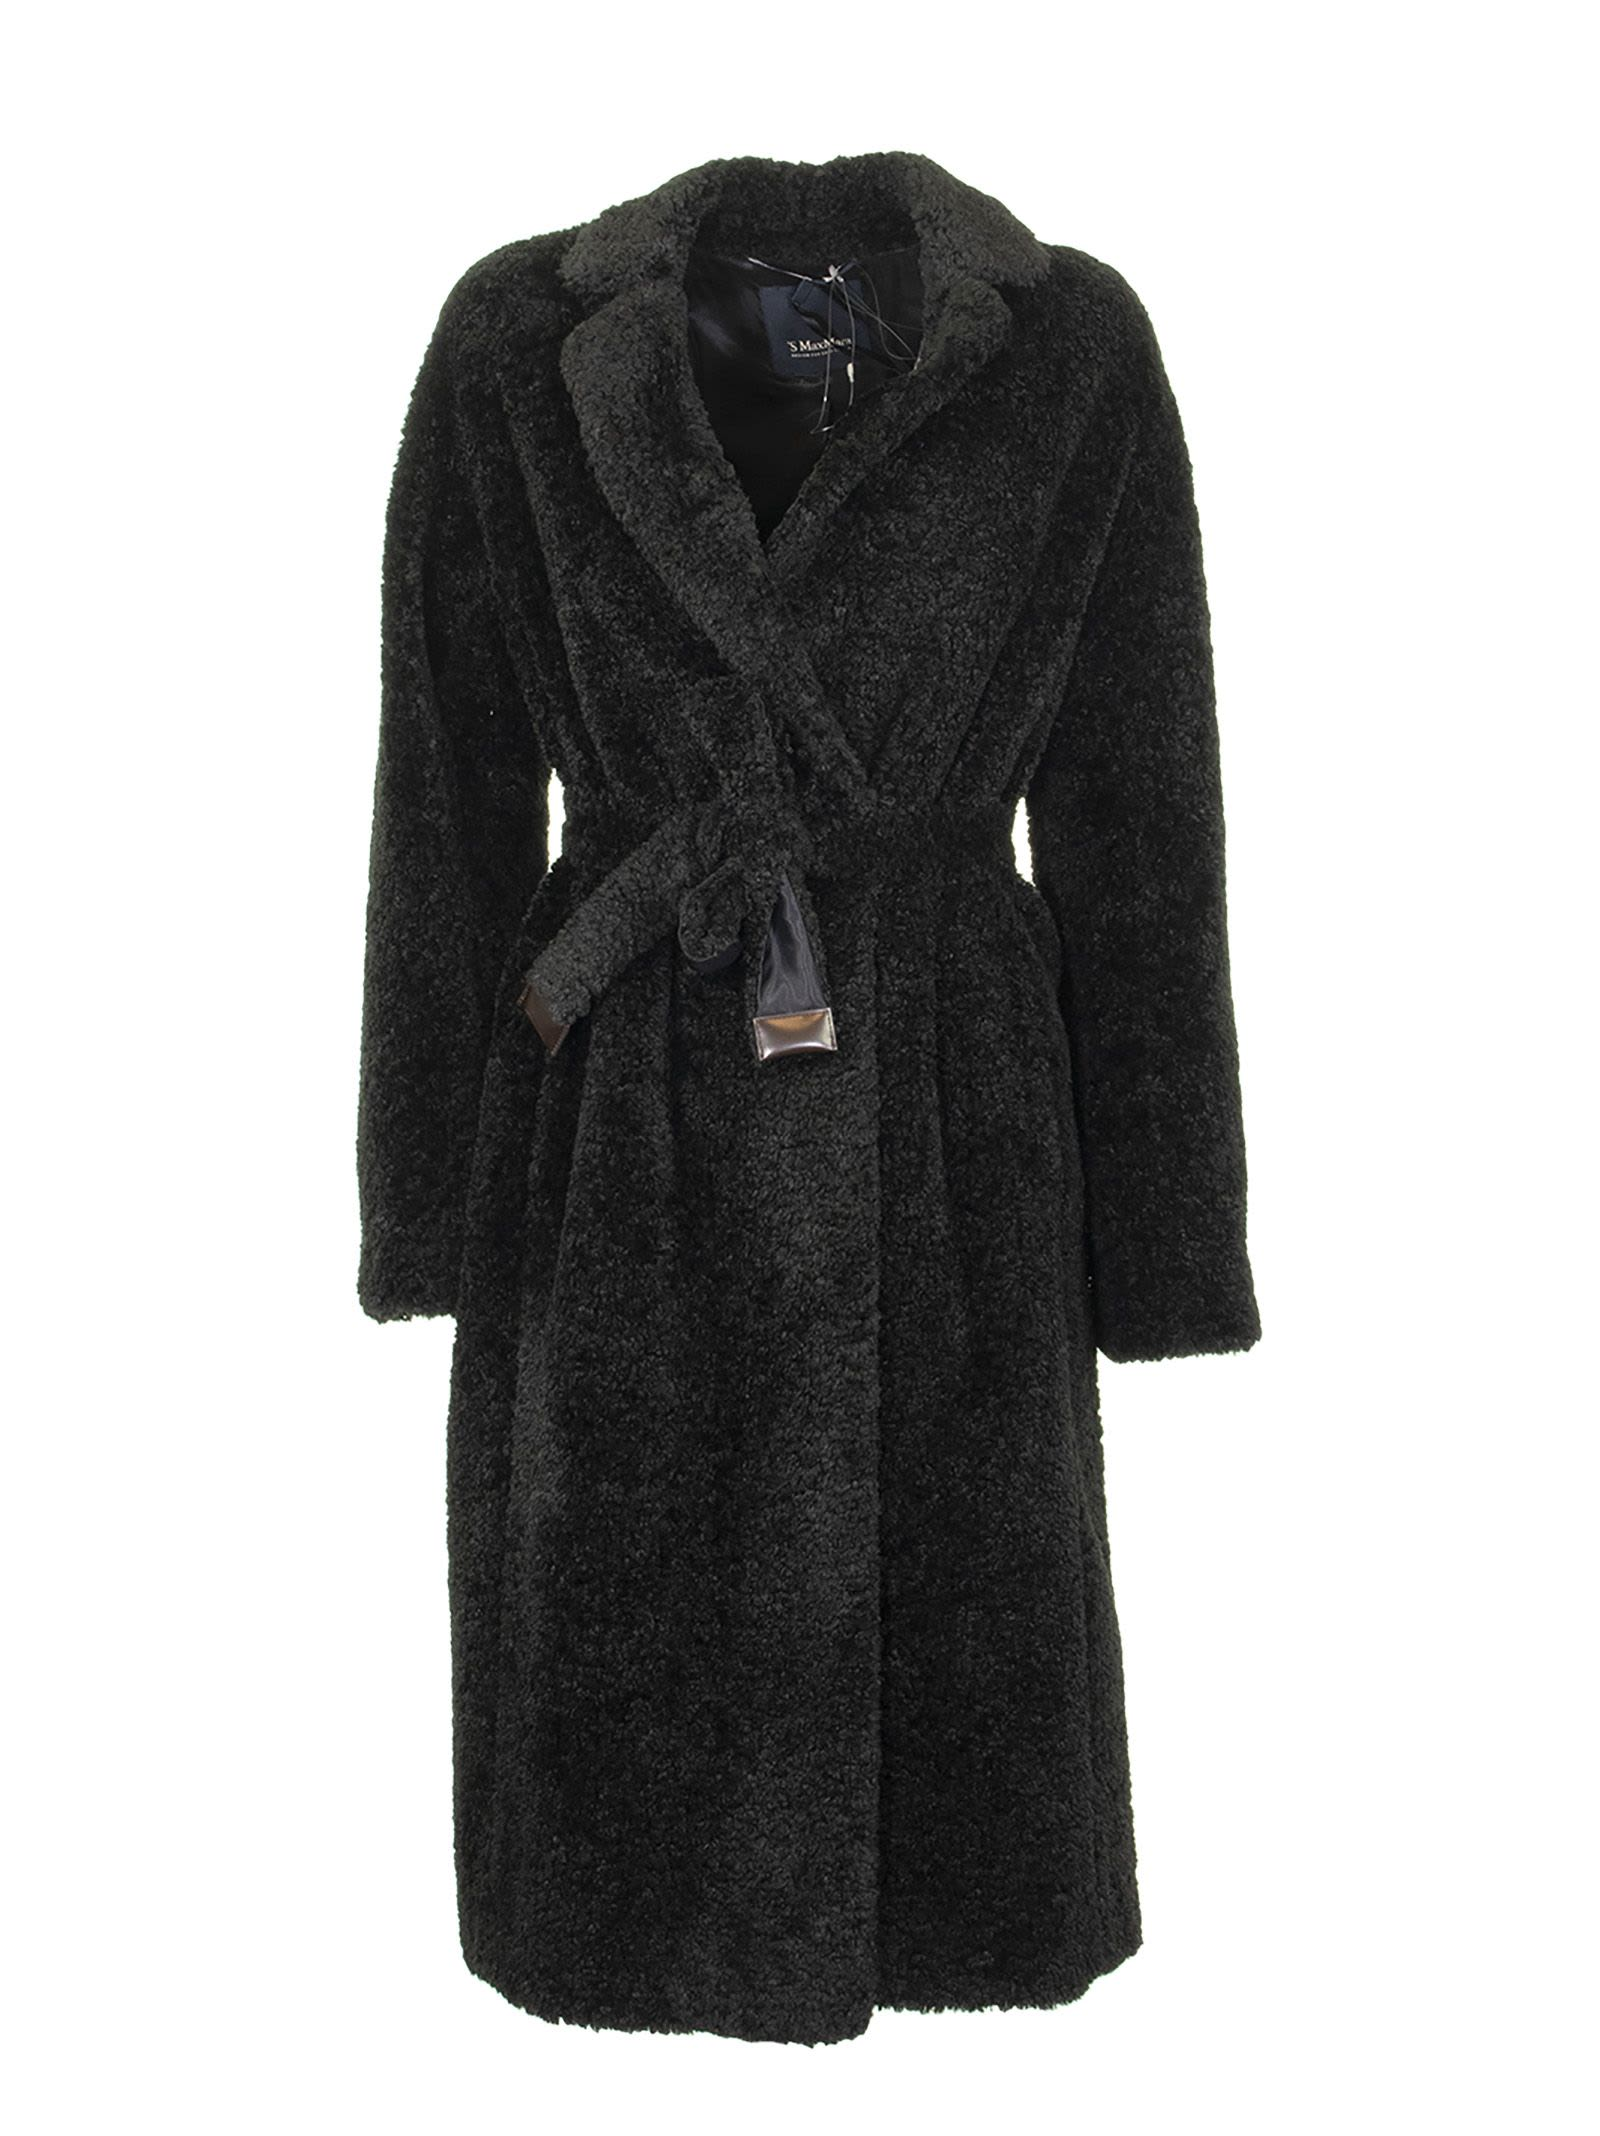 Max Mara Teddy Black Coat